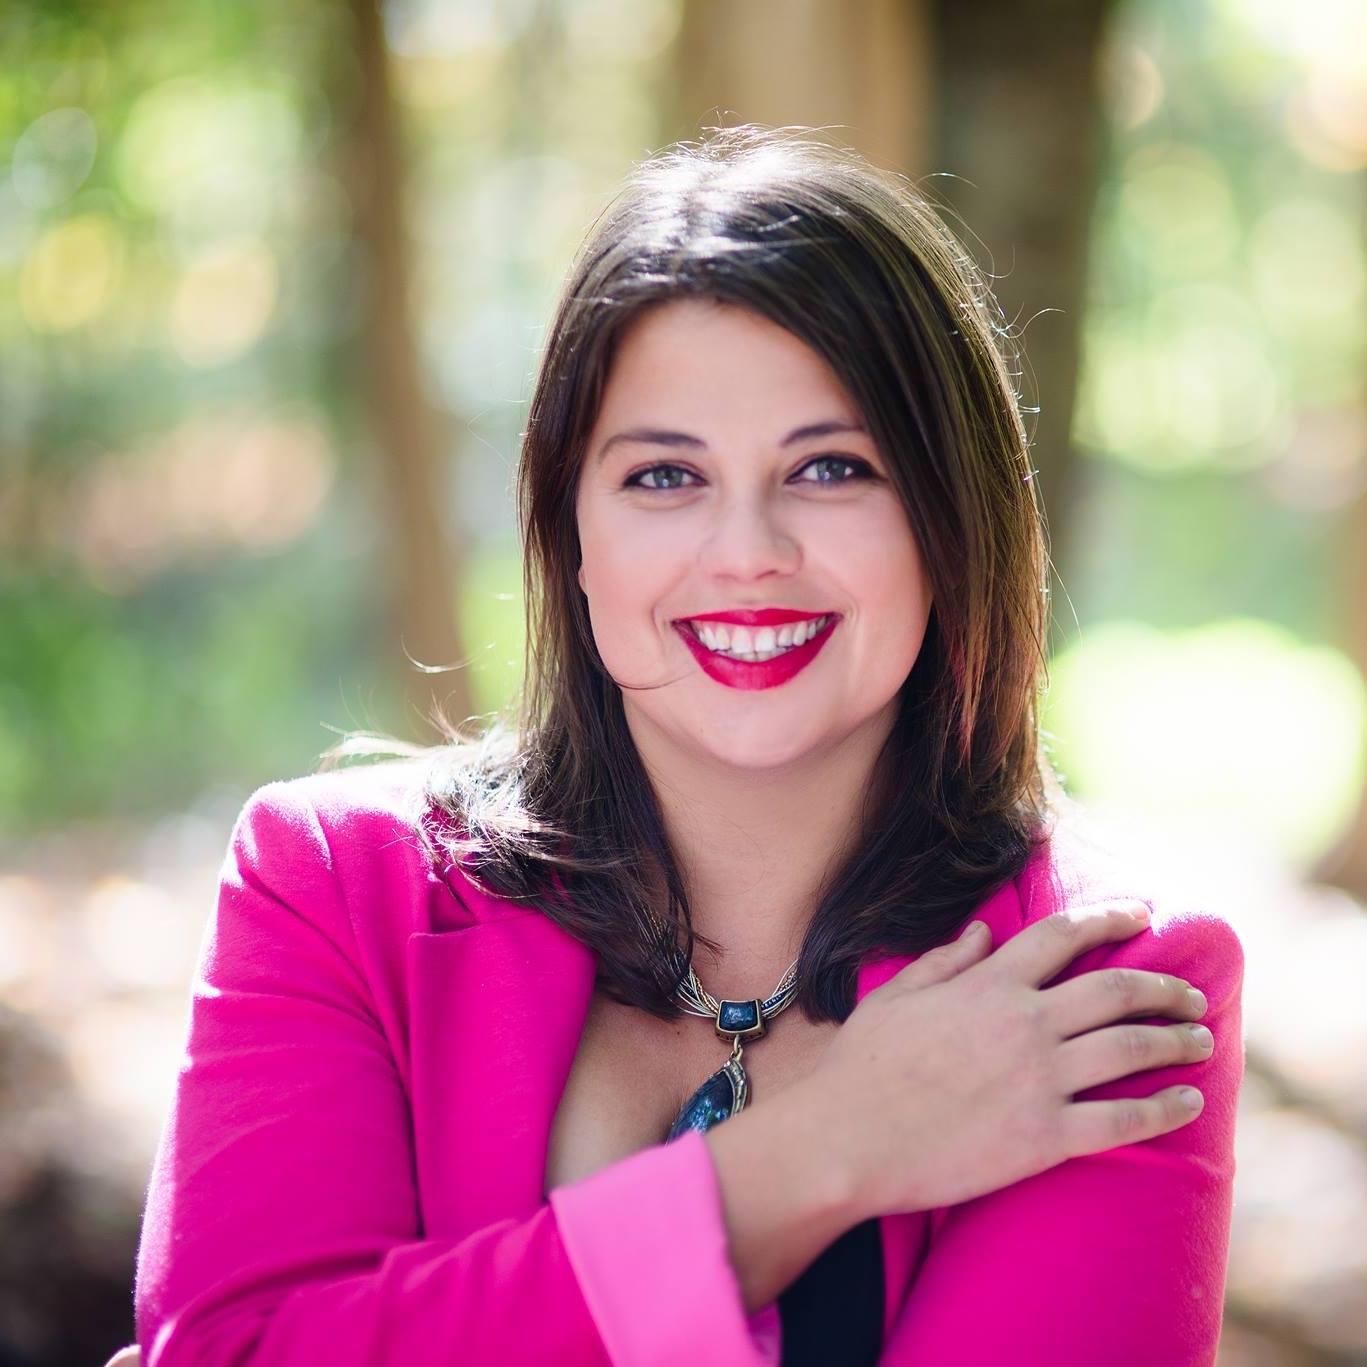 Kristina Agur